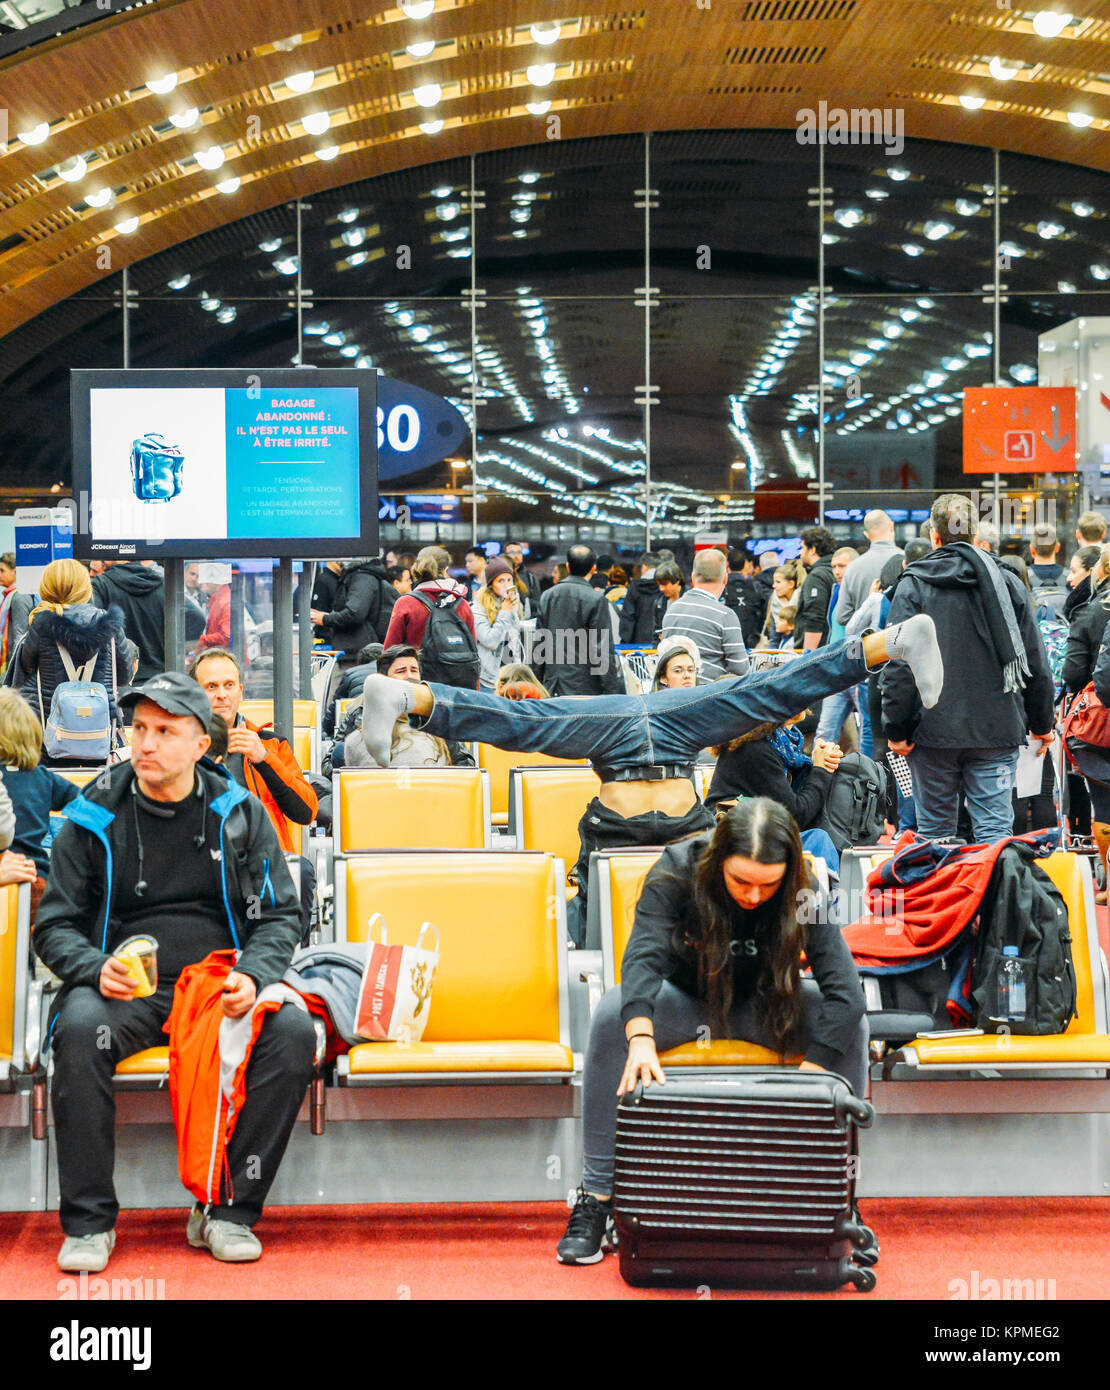 paris-france-december-12th-2017-man-performs-a-splits-prior-to-boarding-KPMEG2.jpg